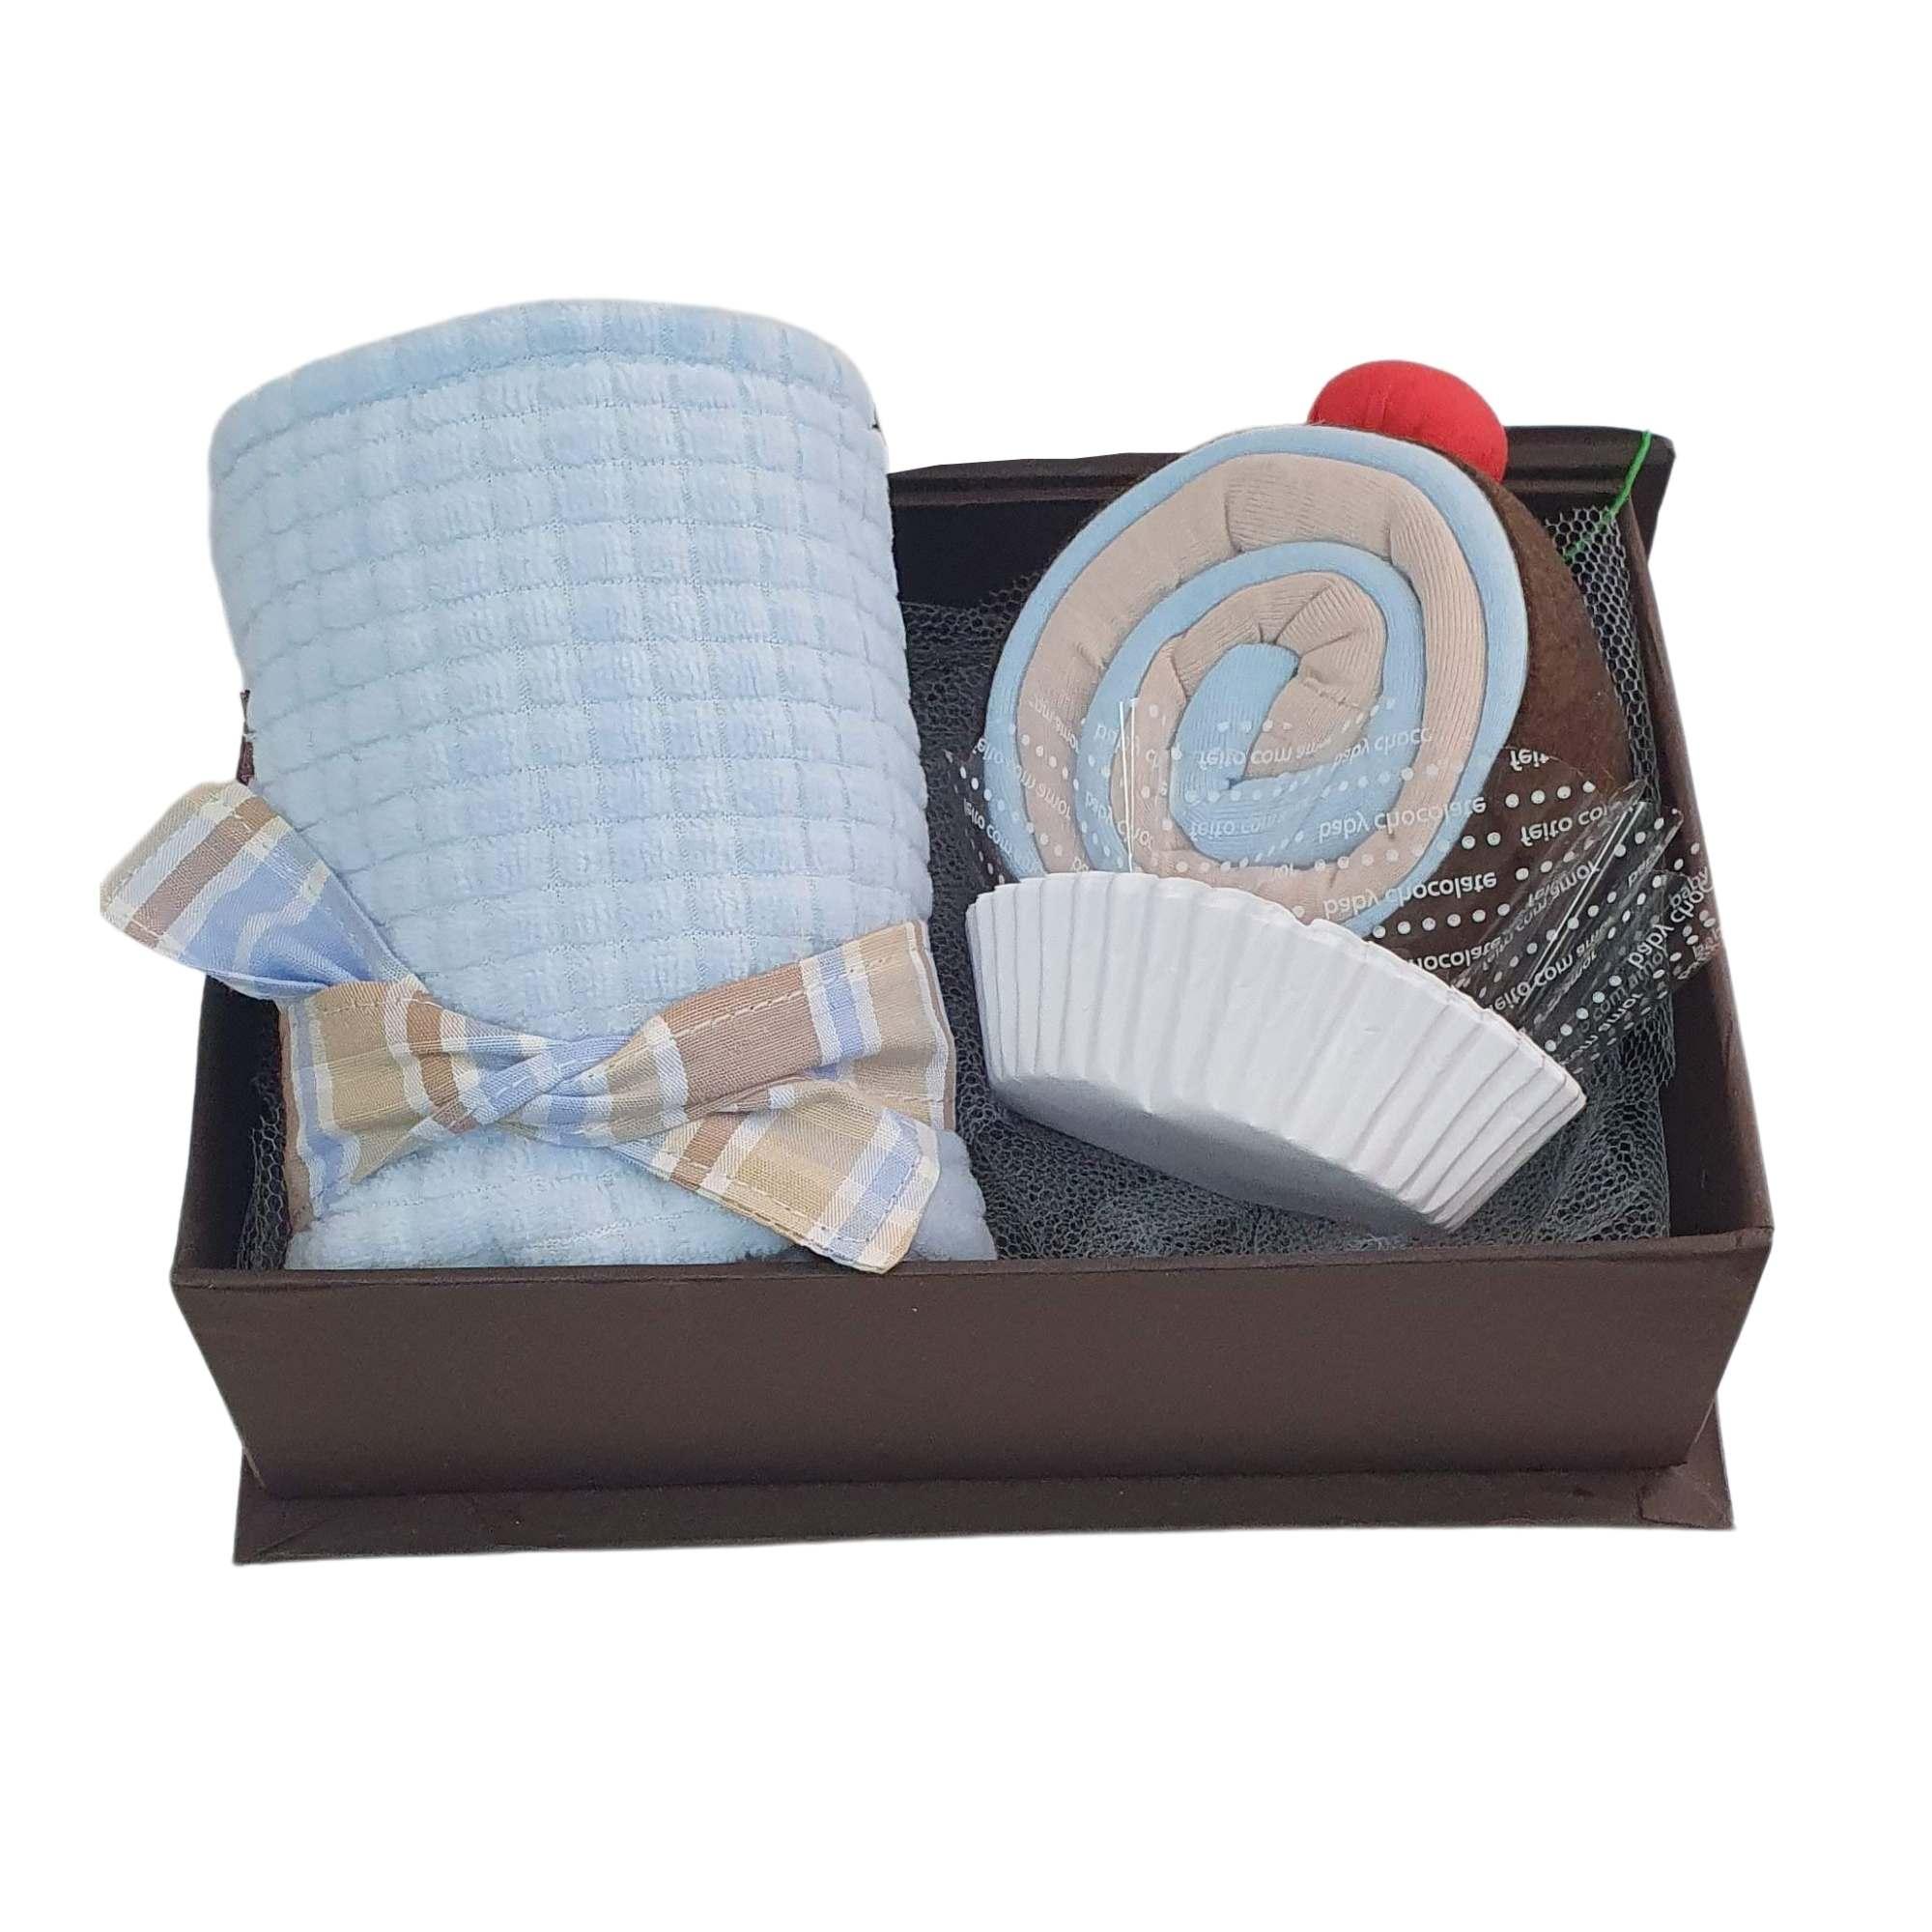 Kit Hora de Dormir Azul